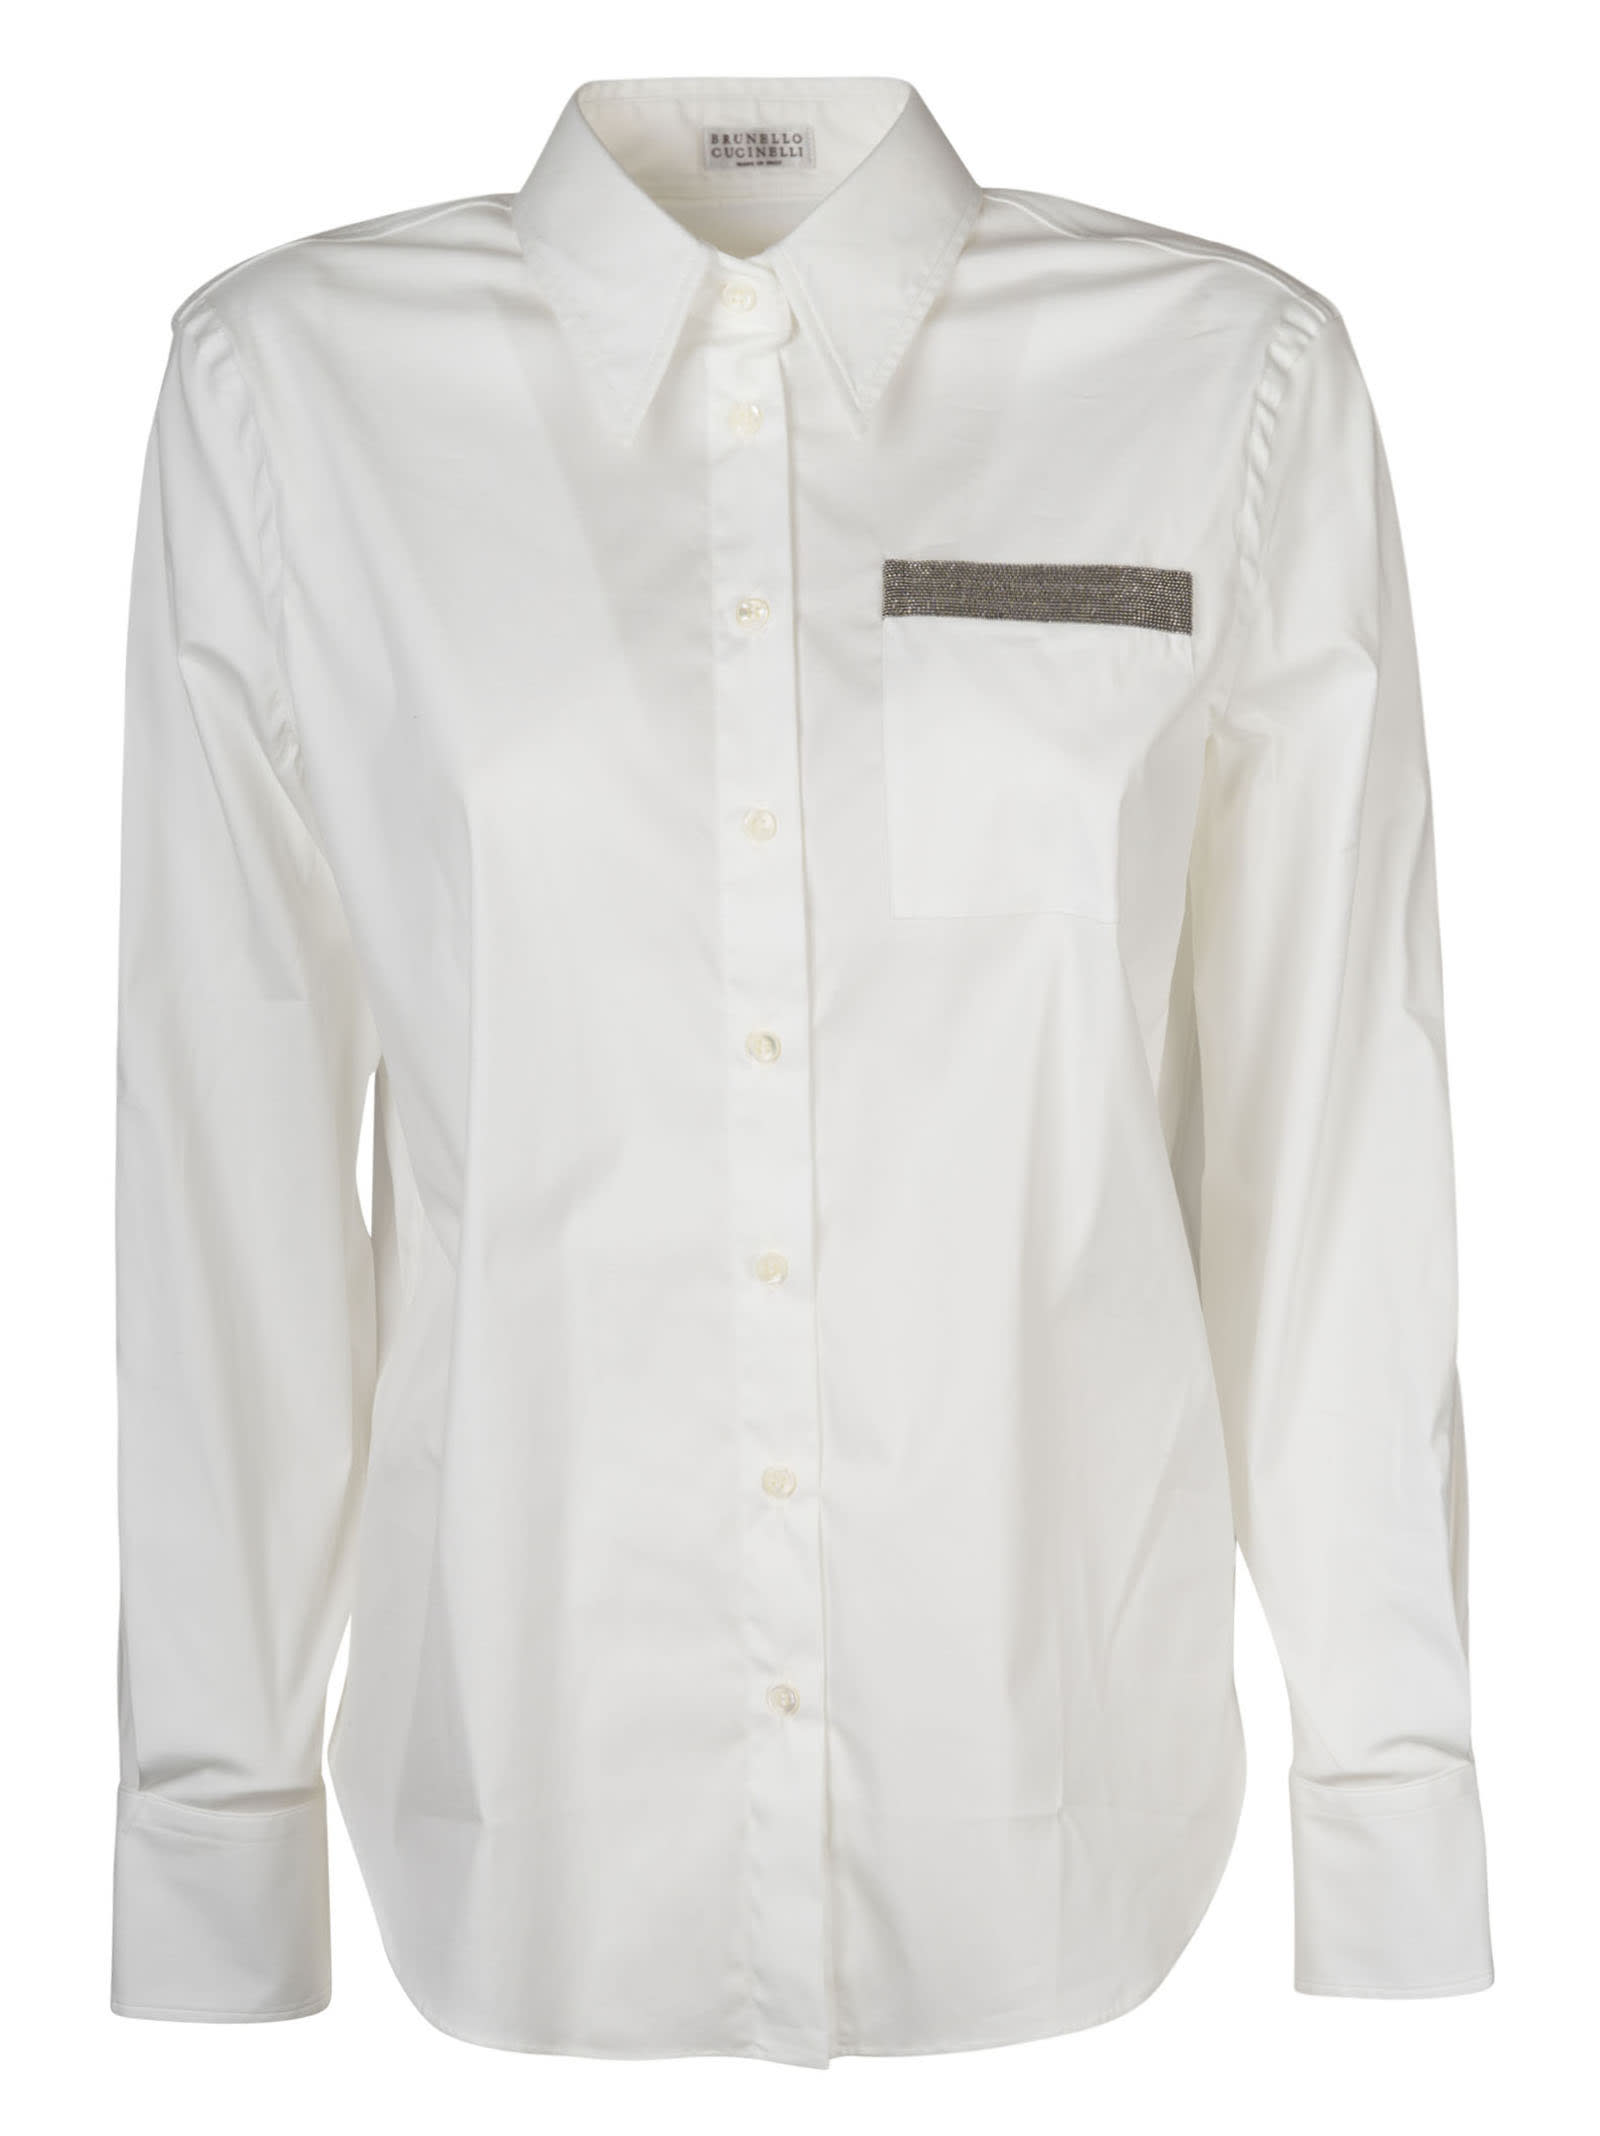 Brunello Cucinelli Shirts BEAD EMBELLISHED SHIRT